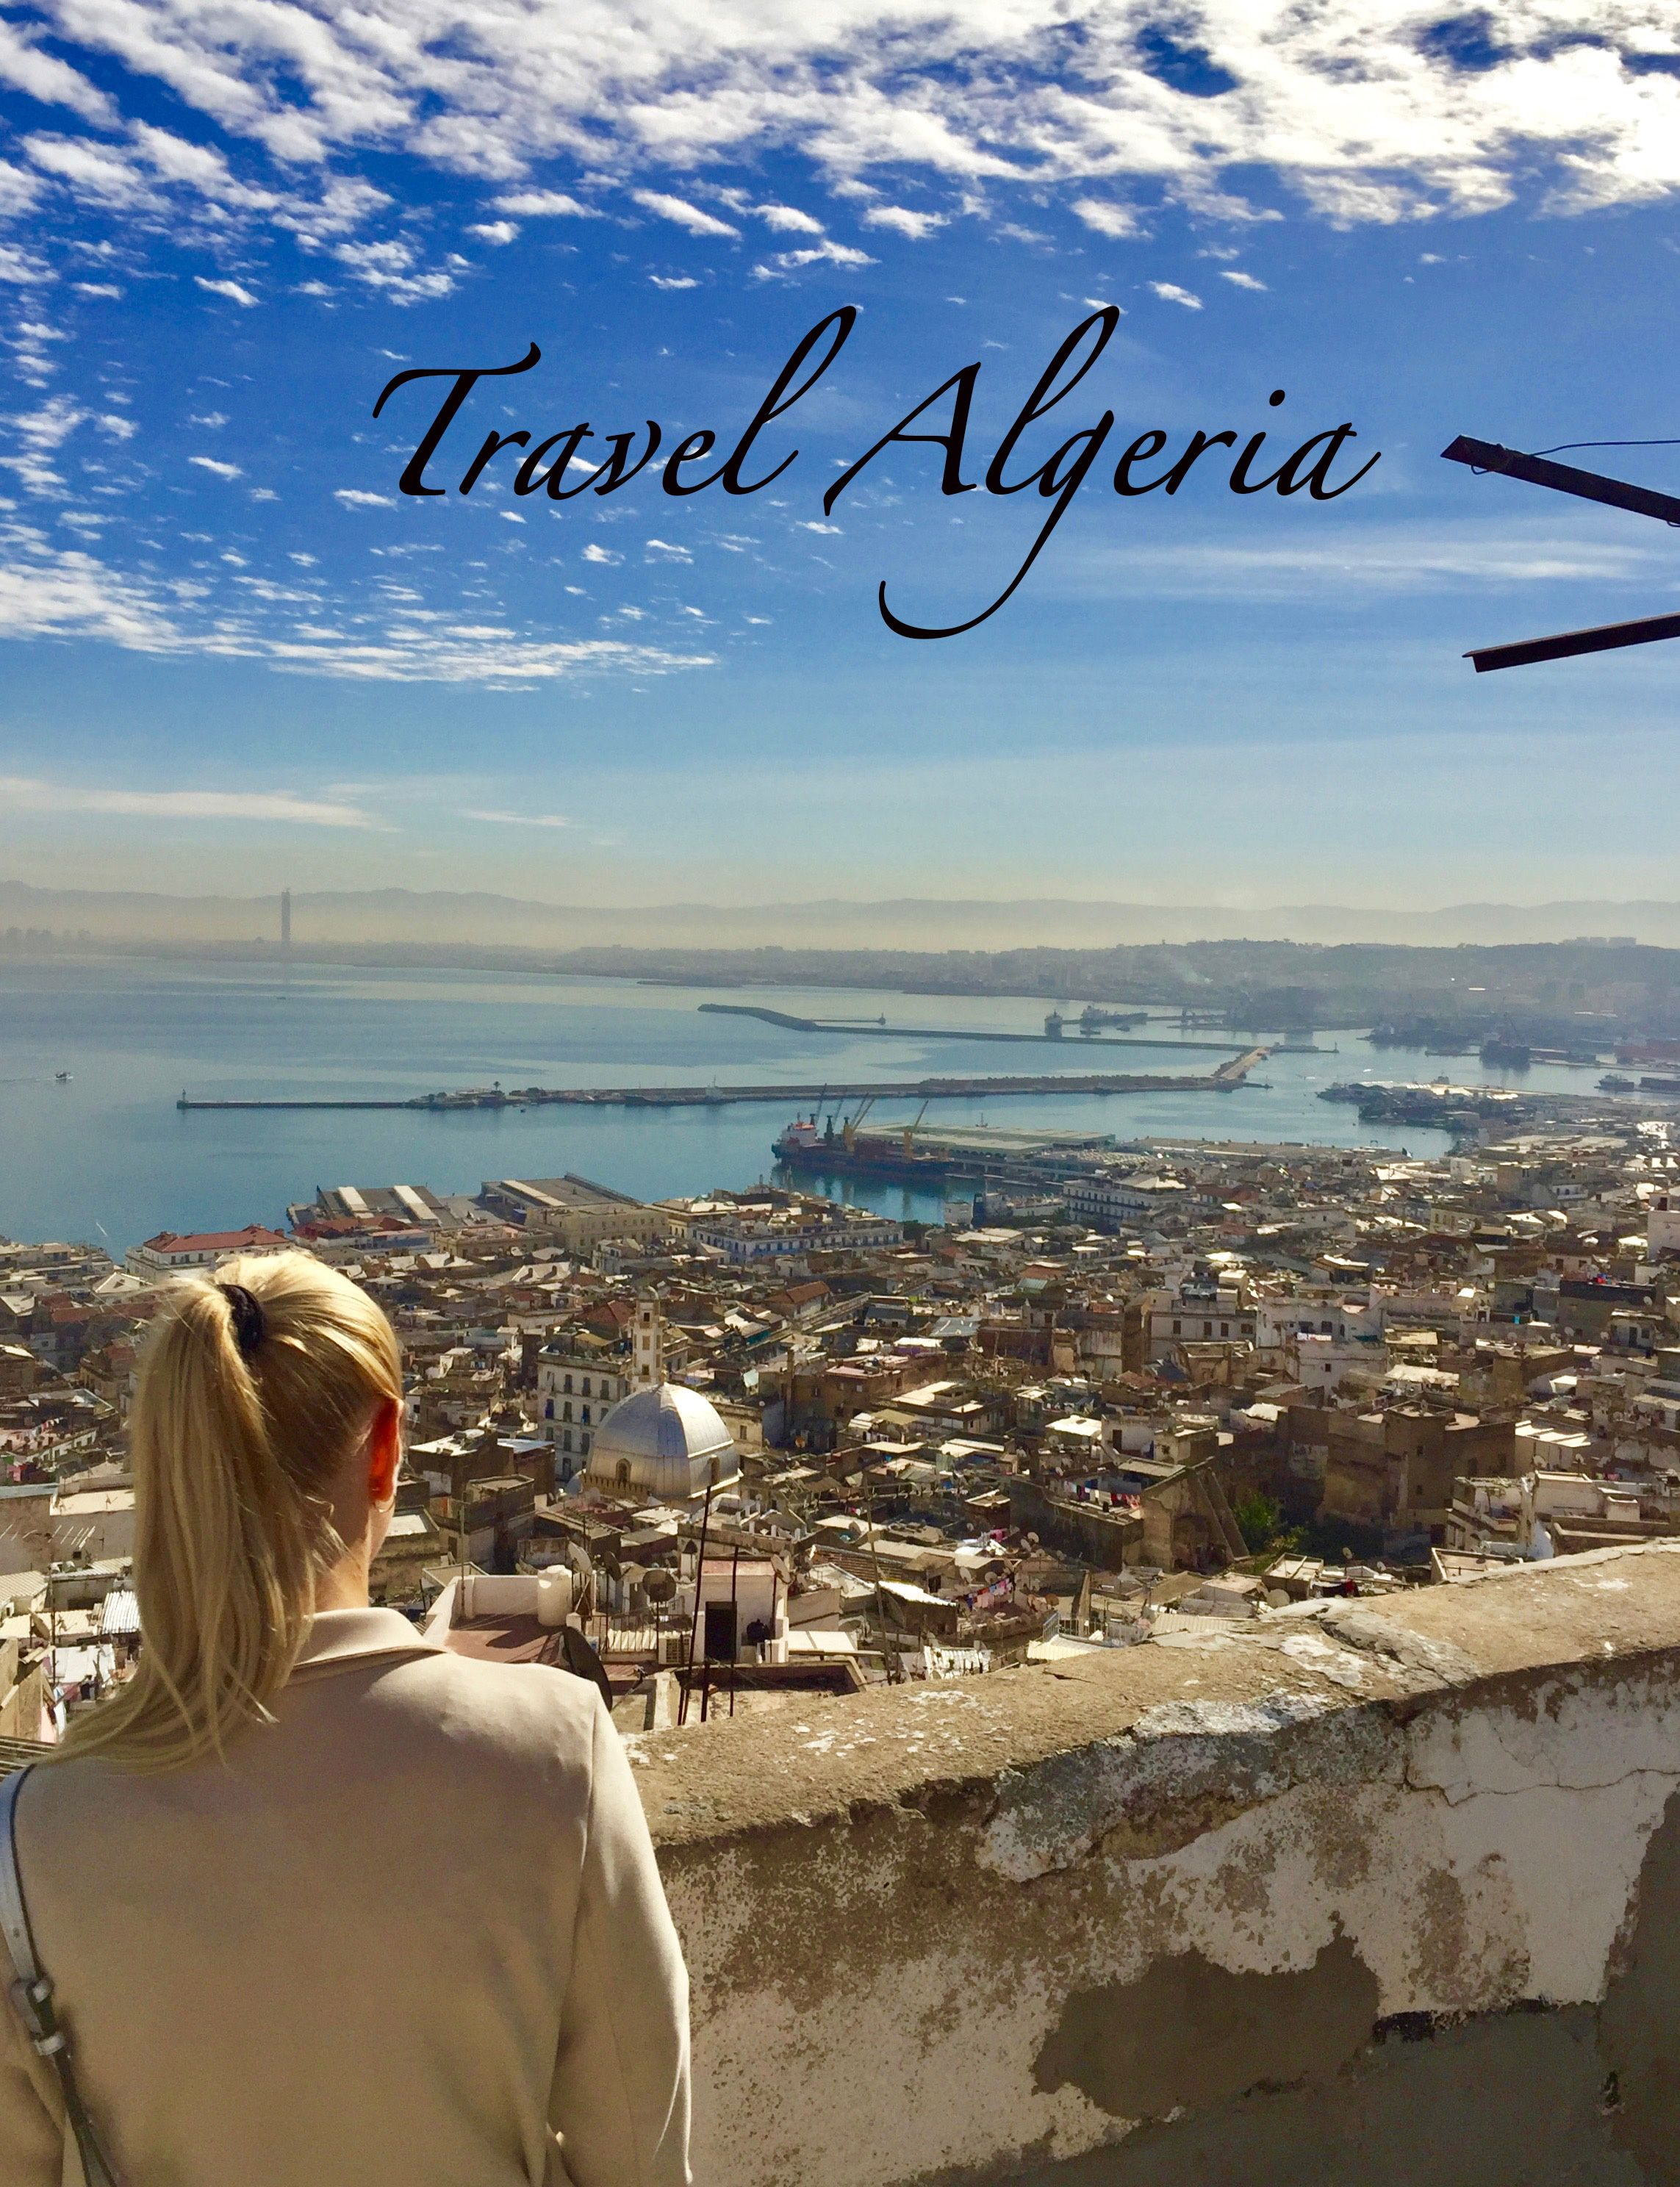 Travel Algeria Urlaub Reisen Afrika Reisen Exotische Orte